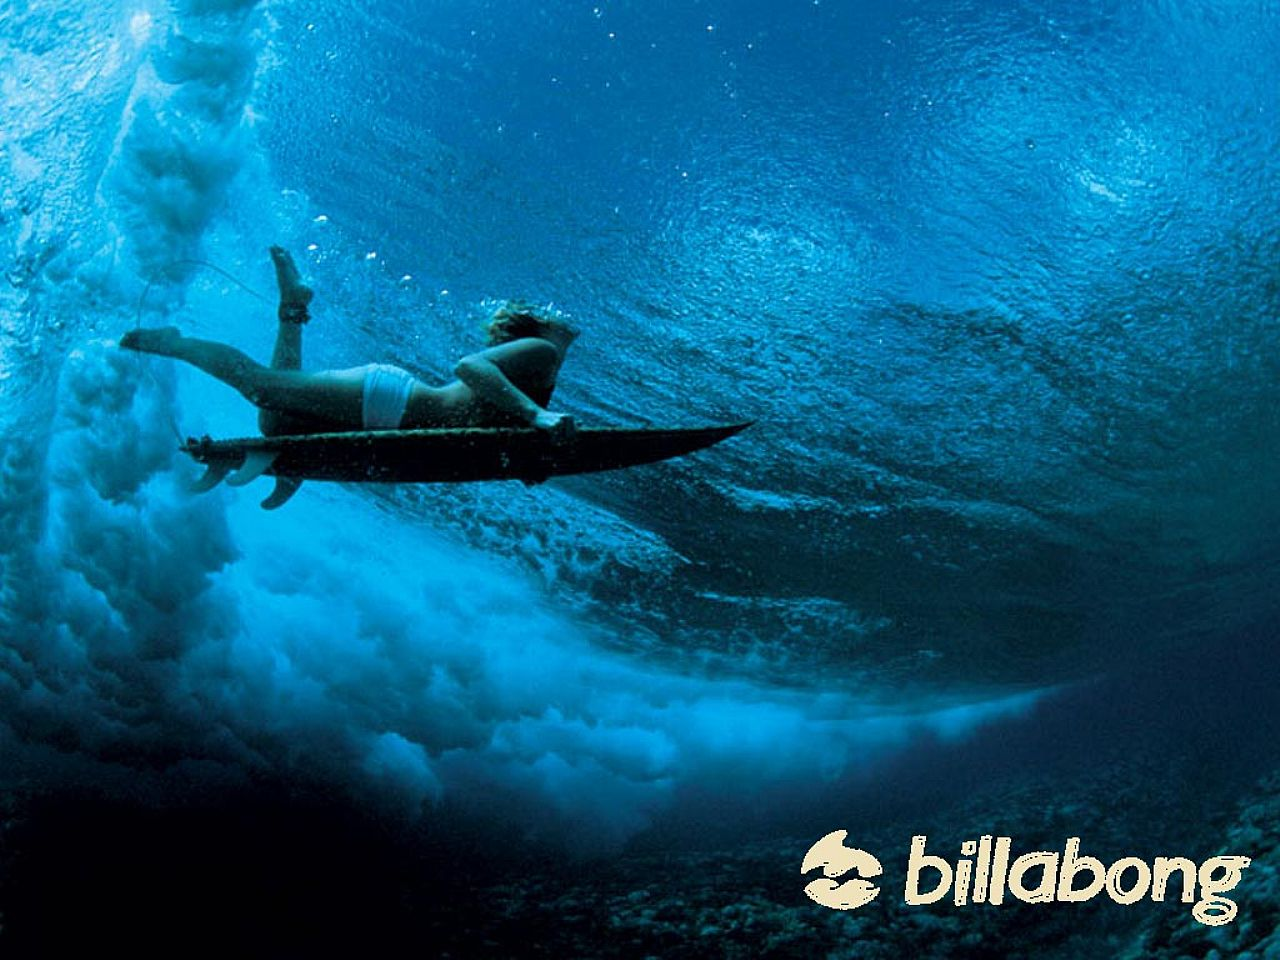 http://4.bp.blogspot.com/-mFgMYhgUBNs/TdLQopnUAgI/AAAAAAAAA4E/Auvo-vhUtWA/s1600/1722011192652_surver+surving+billabong.jpg